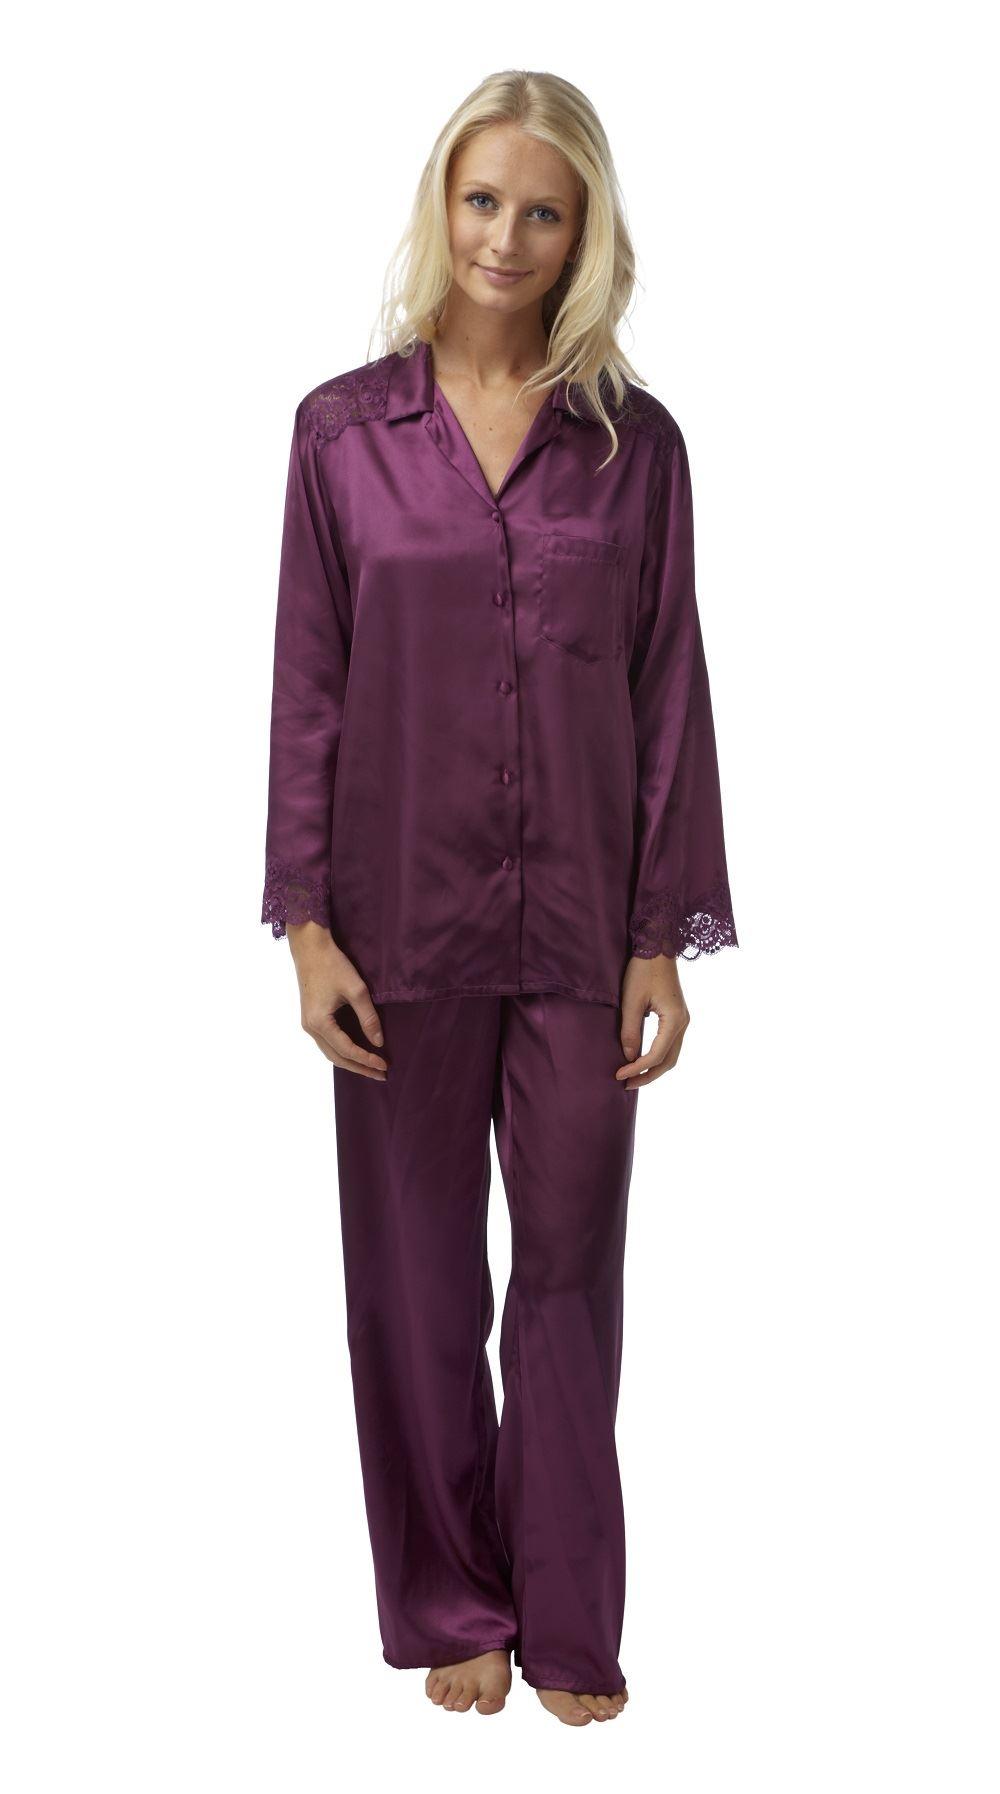 ladies satin pyjamas pajama plus size 18 20 22 24 26 28. Black Bedroom Furniture Sets. Home Design Ideas